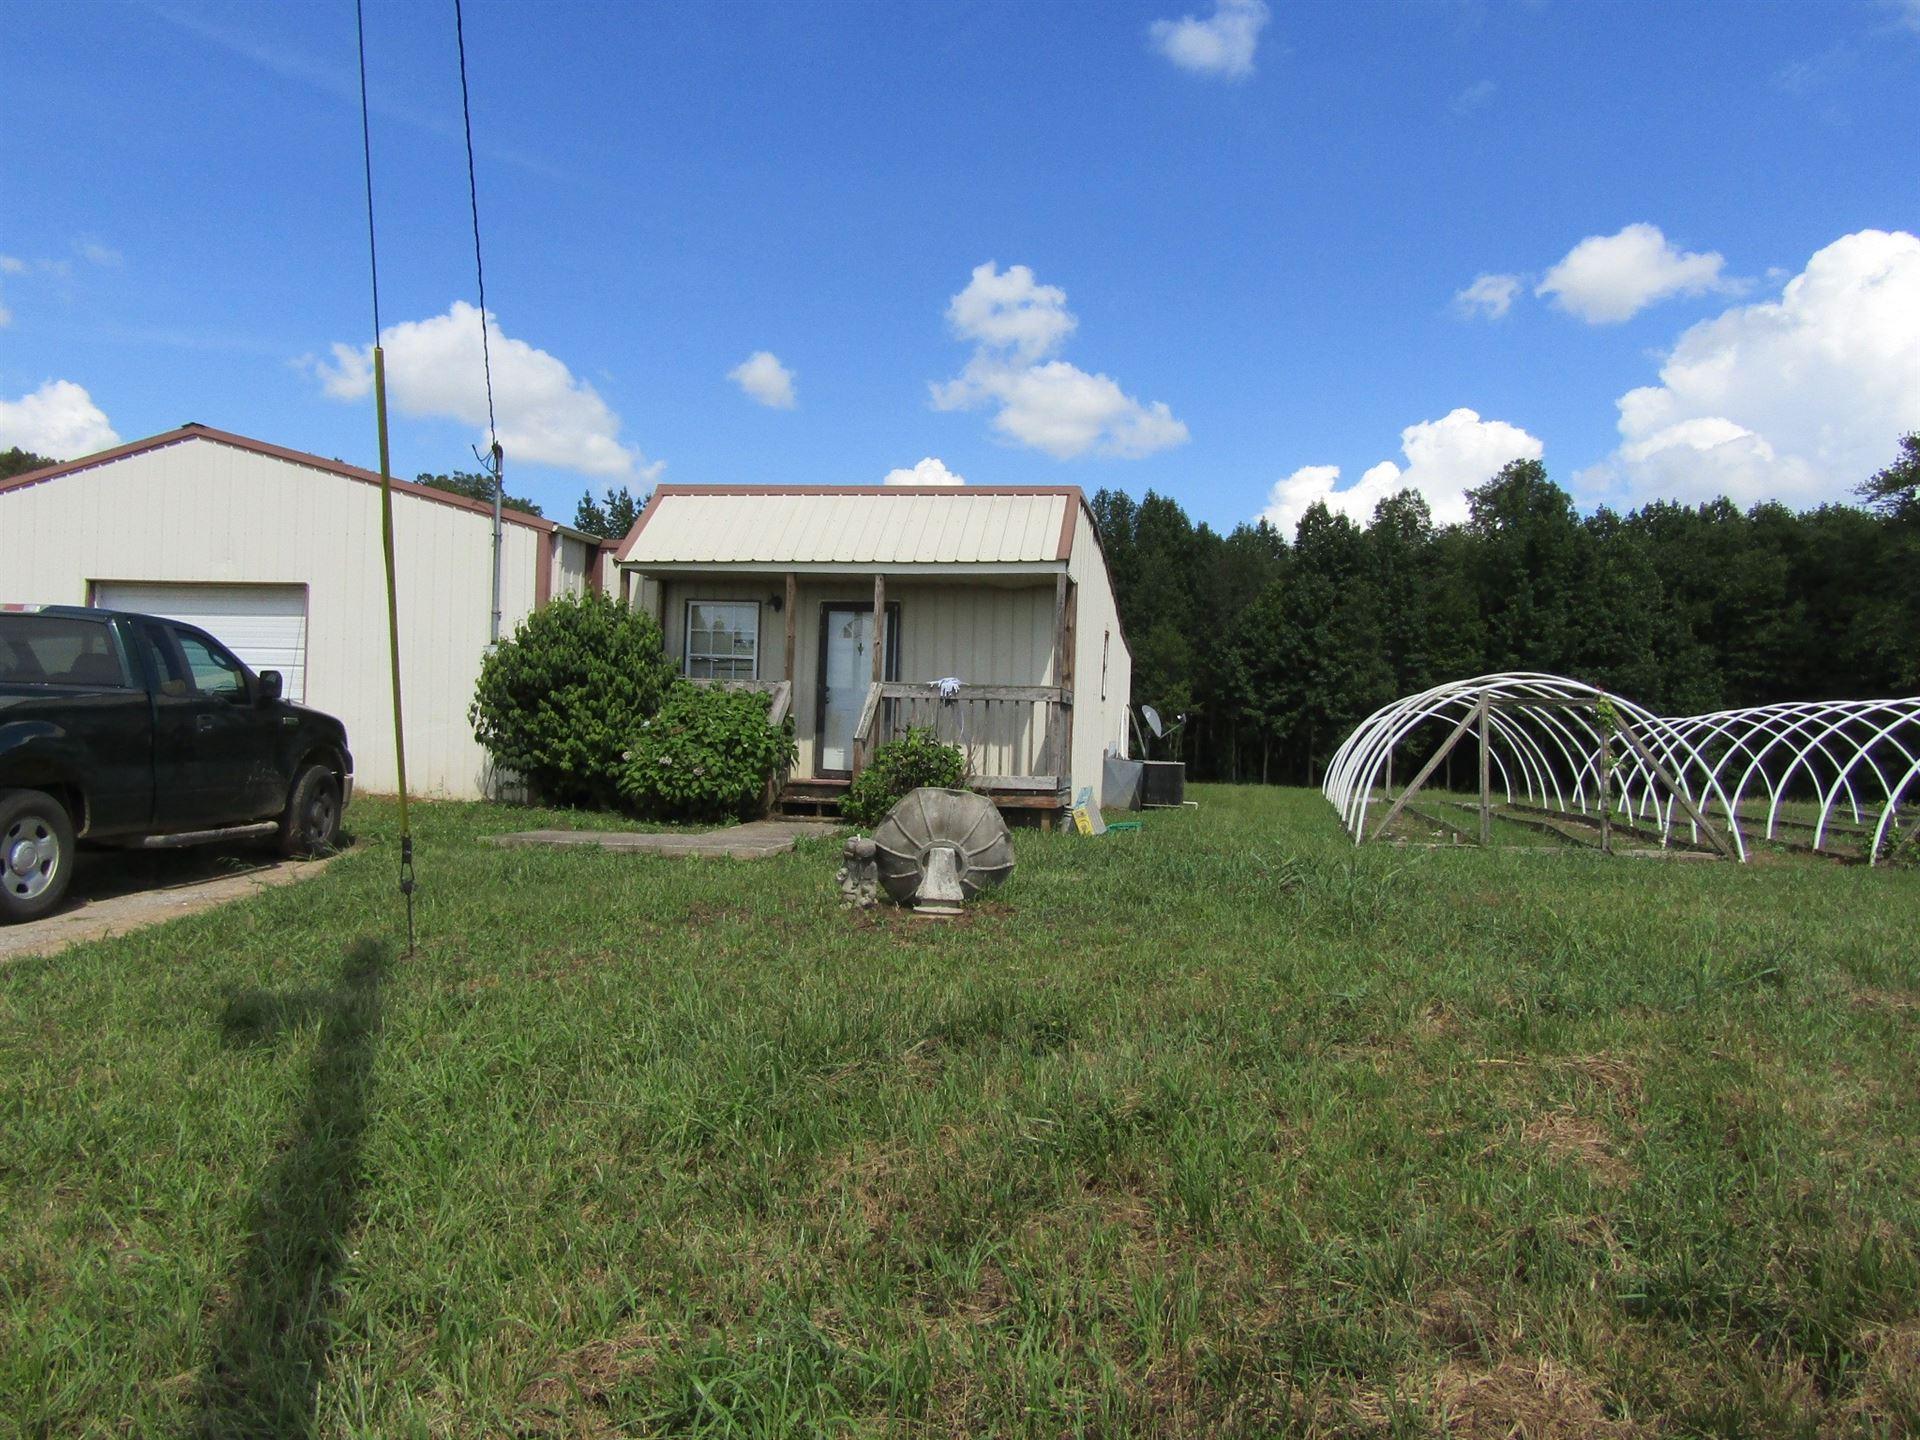 960 Caney Branch Rd, Morrison, TN 37357 - MLS#: 2175429